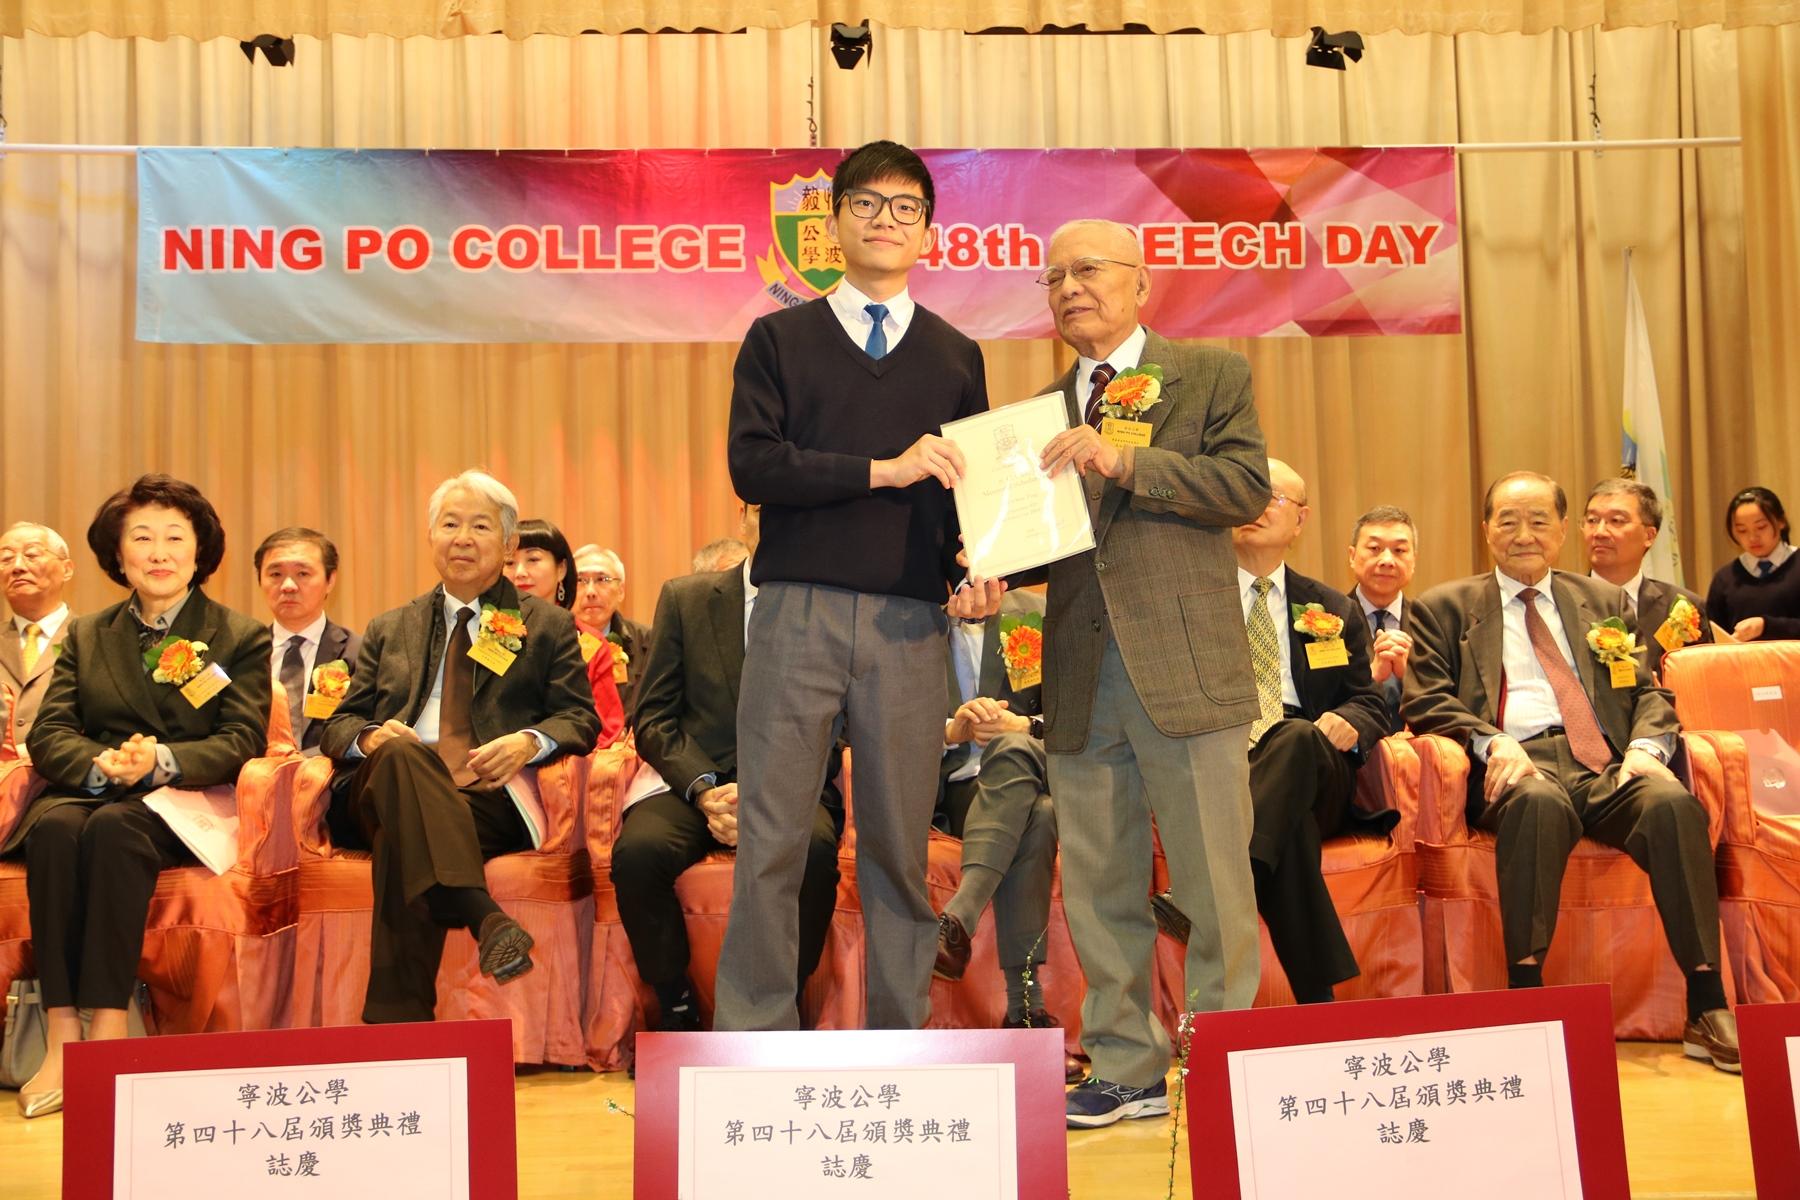 http://npc.edu.hk/sites/default/files/img_7073.jpg